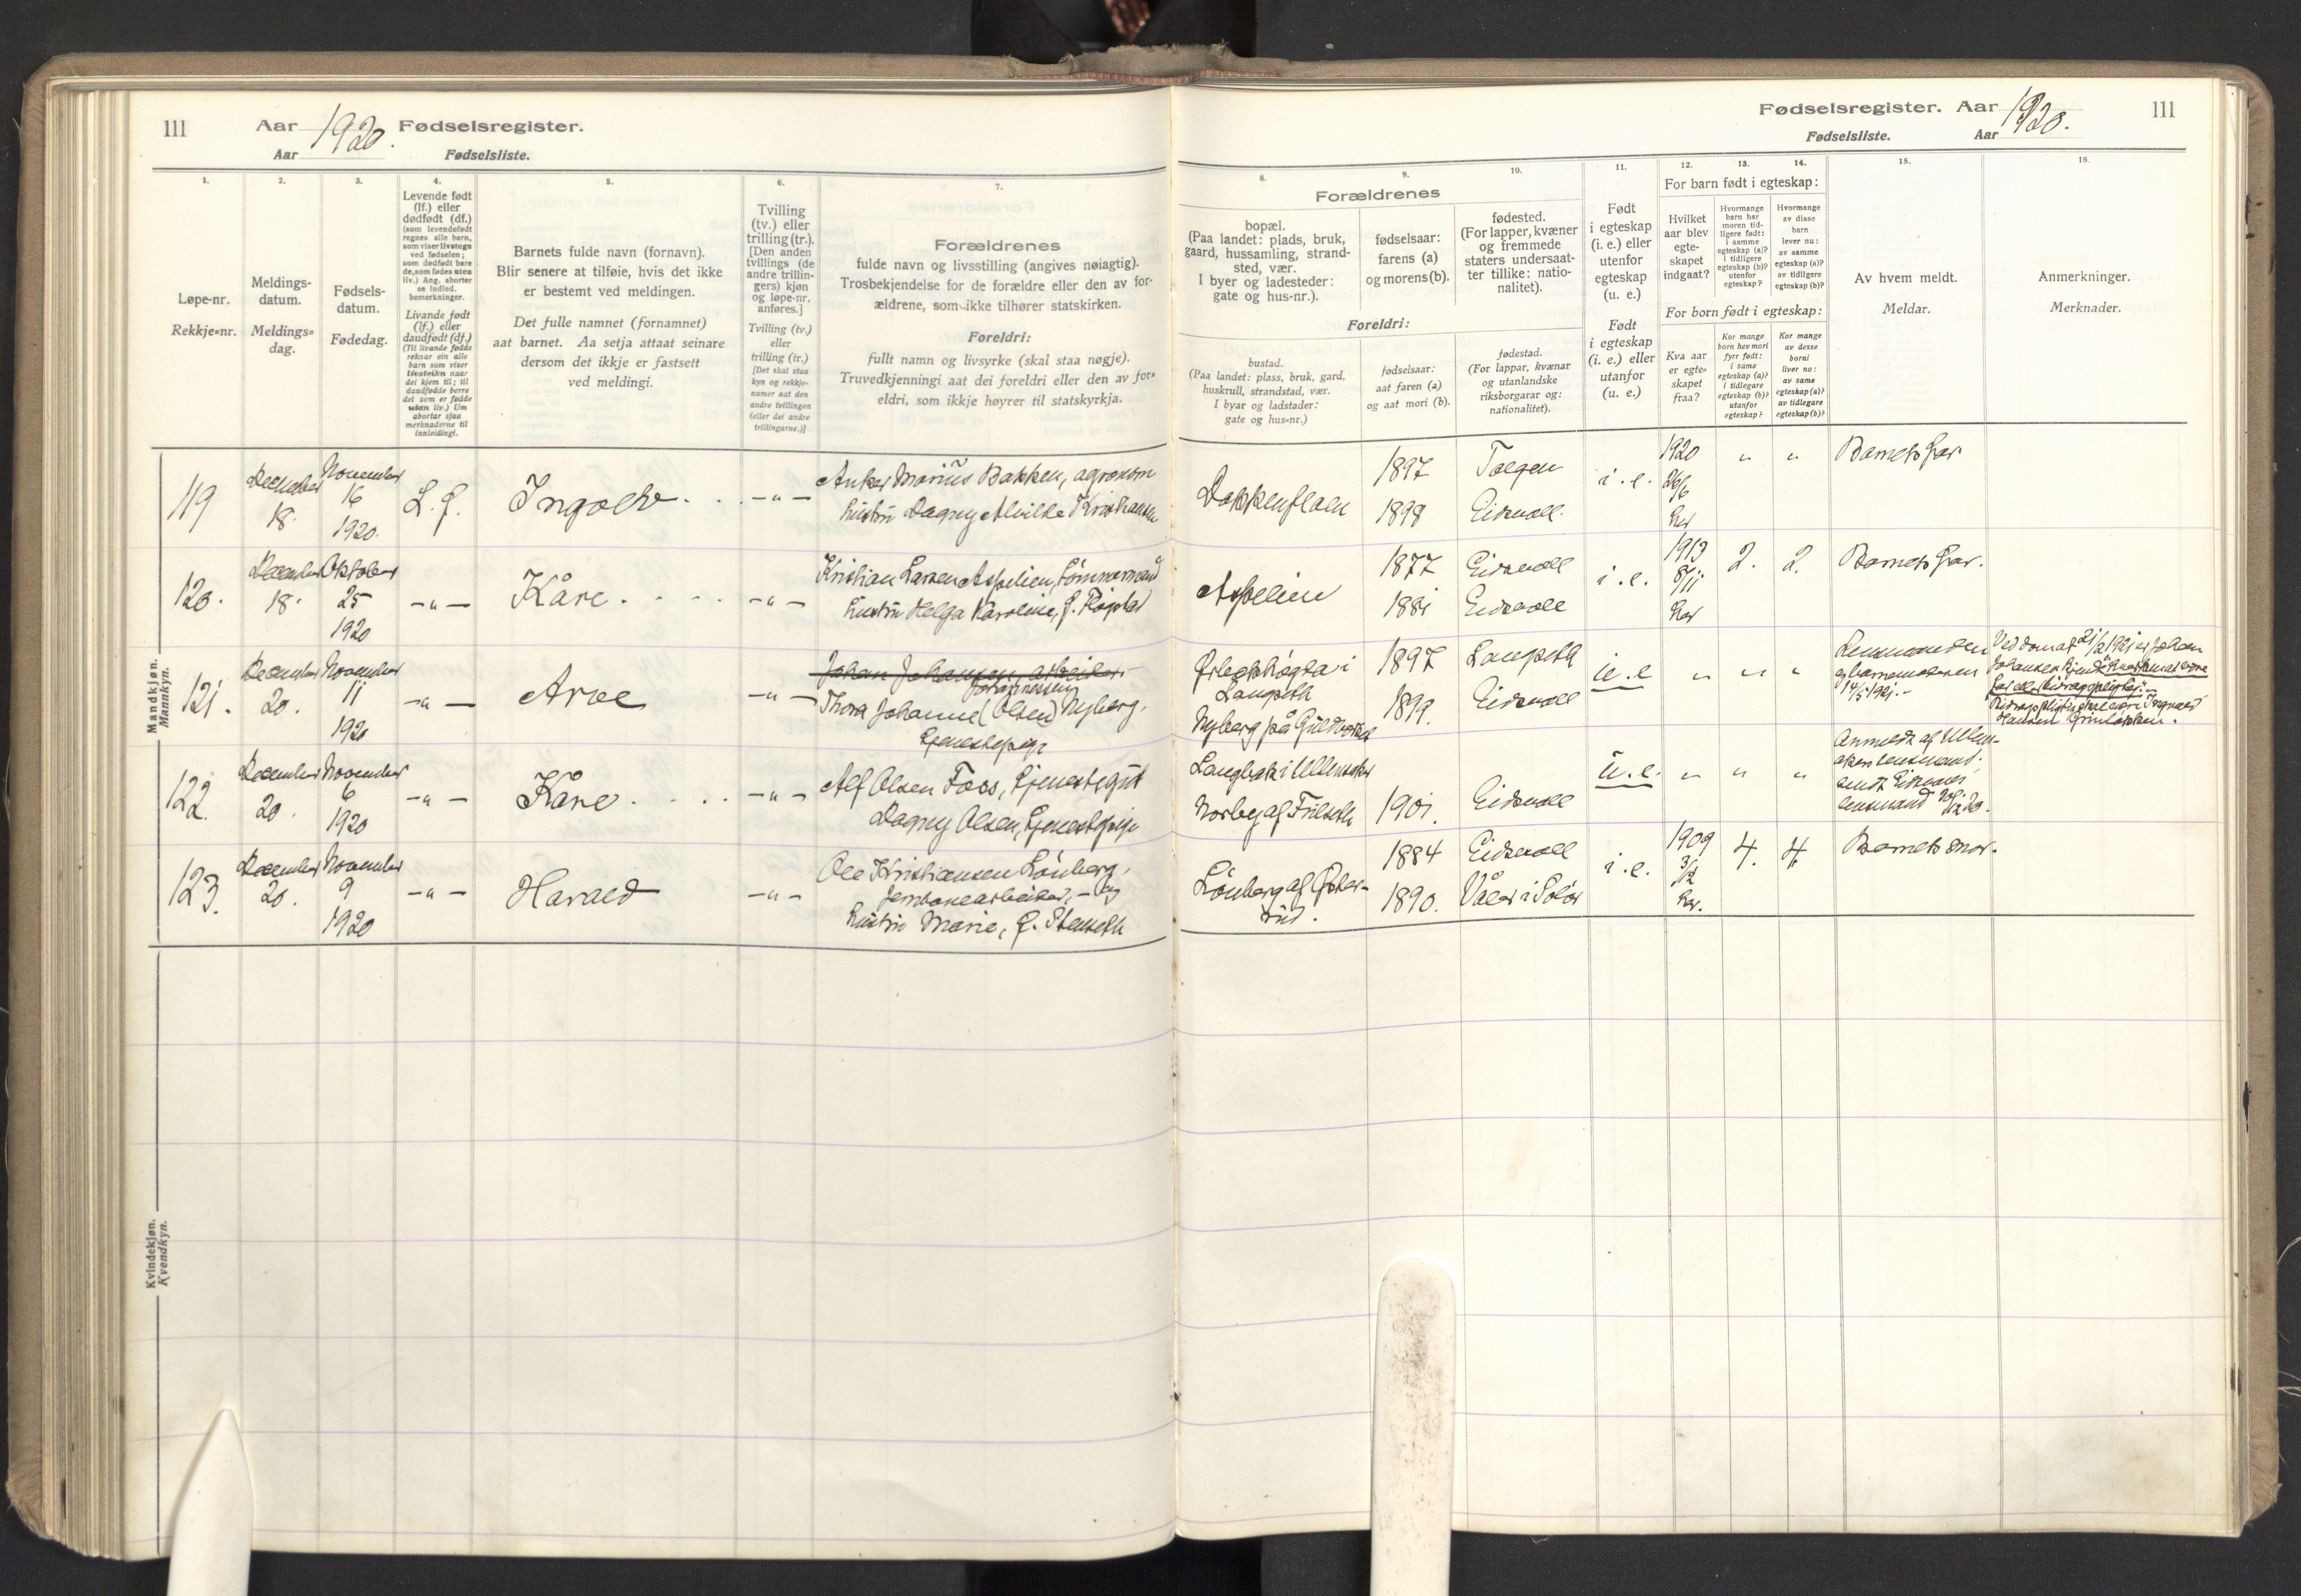 SAO, Eidsvoll prestekontor Kirkebøker, Birth register no. I 1, 1916-1924, p. 111